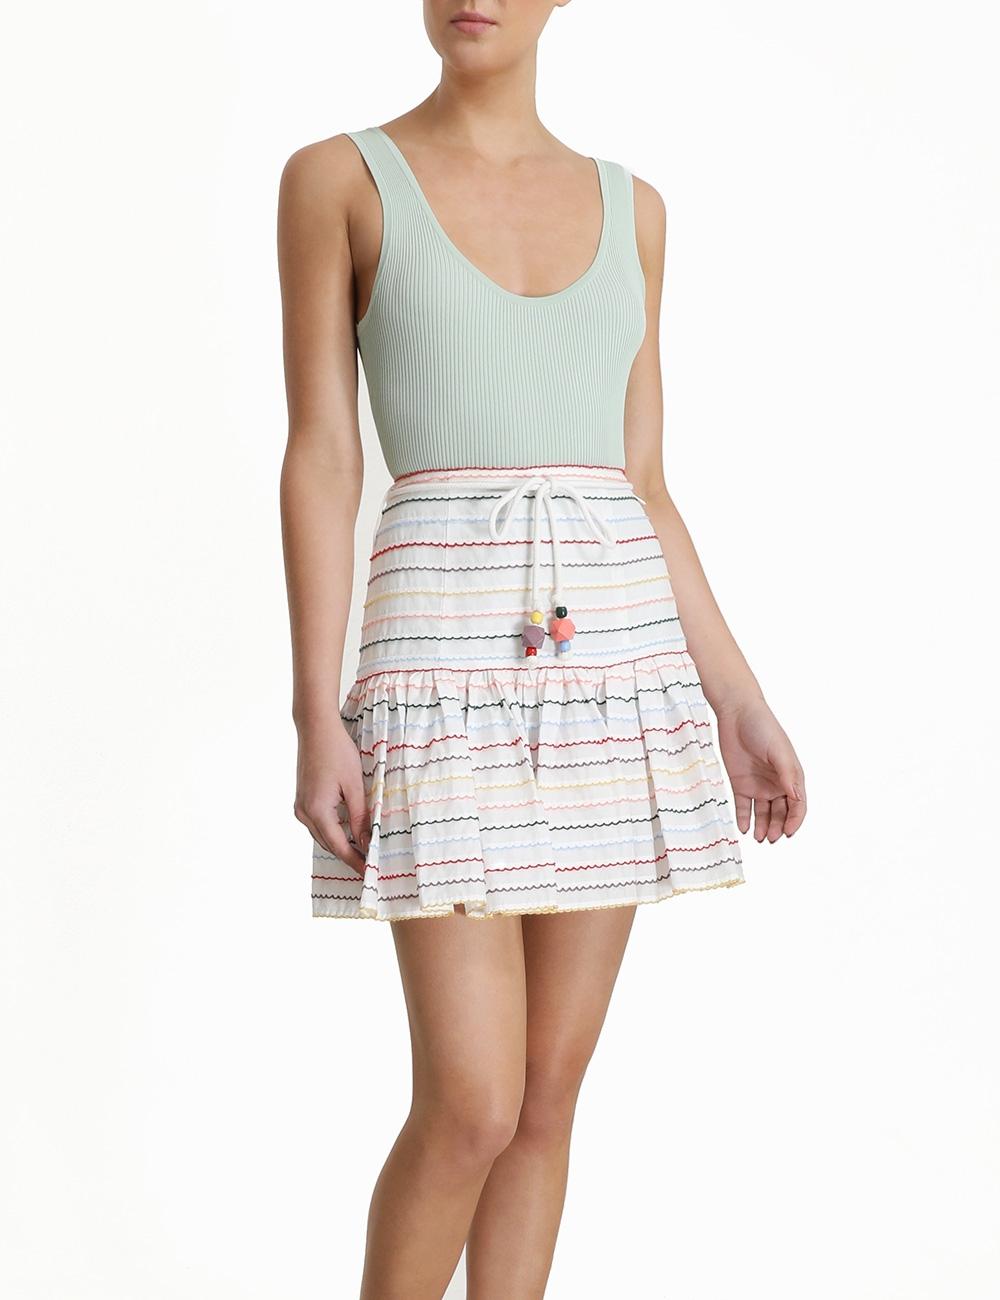 Zinnia Scallop Stripe Skirt